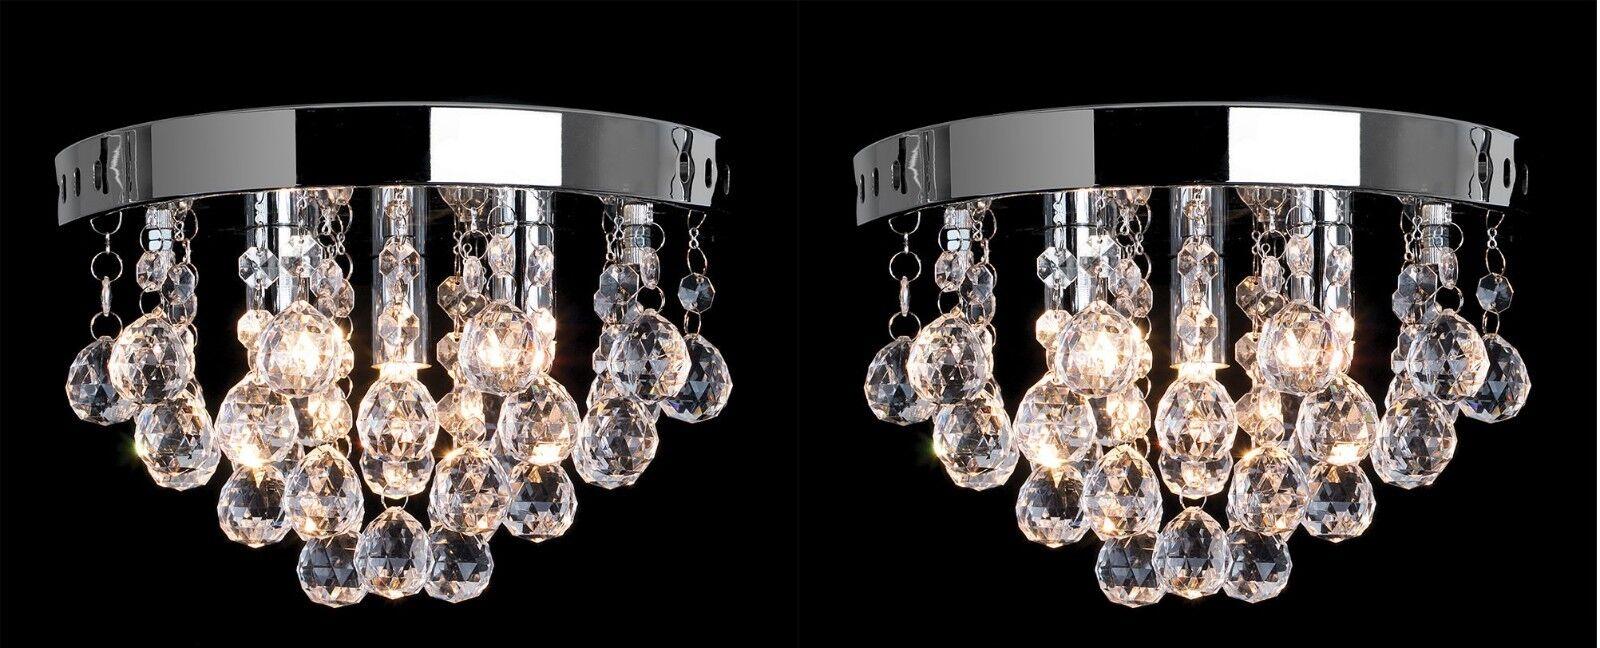 2x bijou Lustre Rond Plafonnier en Cascade de Cristal Transparent Pendentif Pendentif Transparent 03e0ff